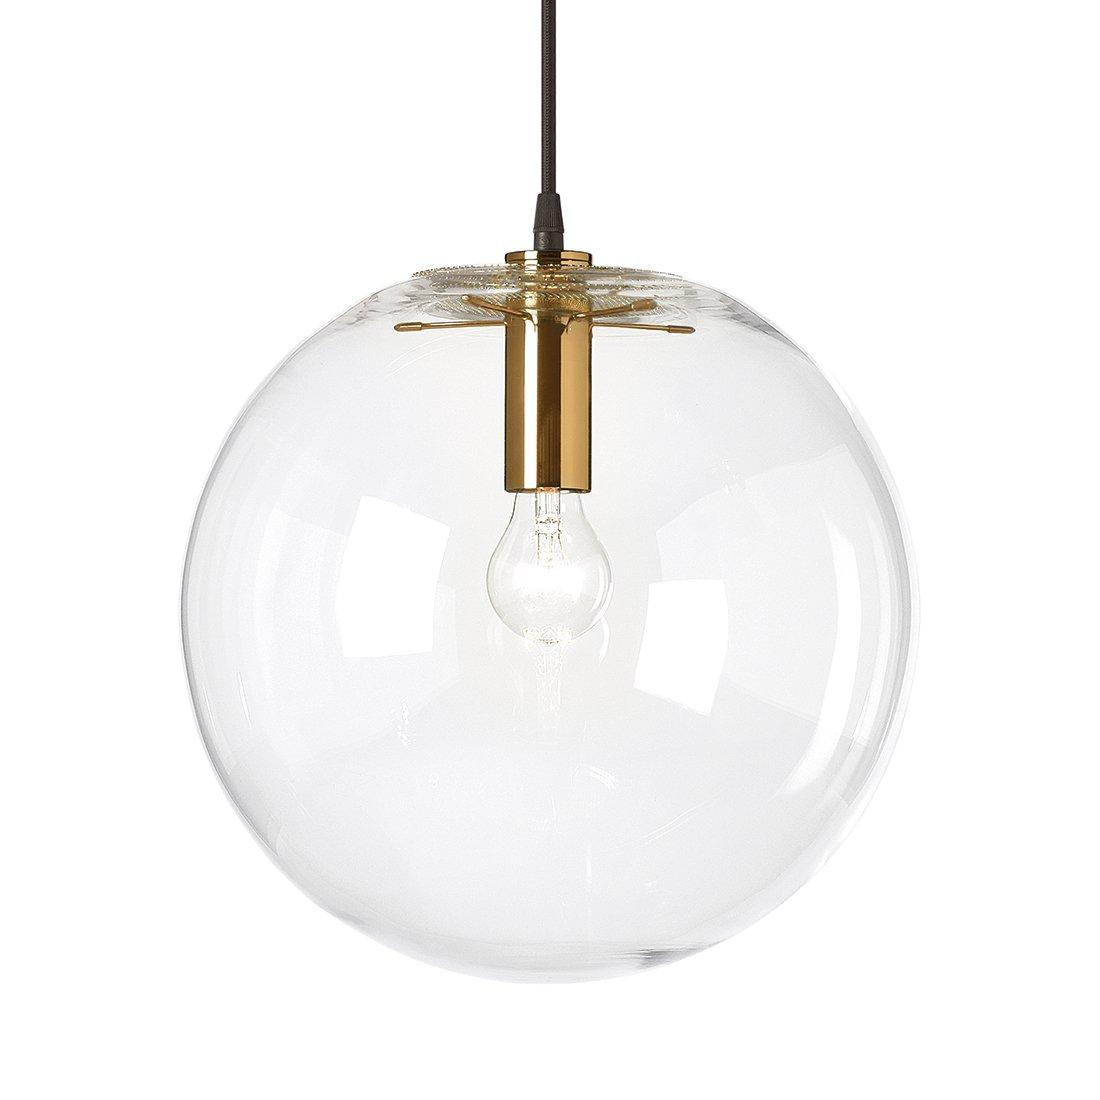 ClassiCon Selene Hanglamp Messing - �35 cm.